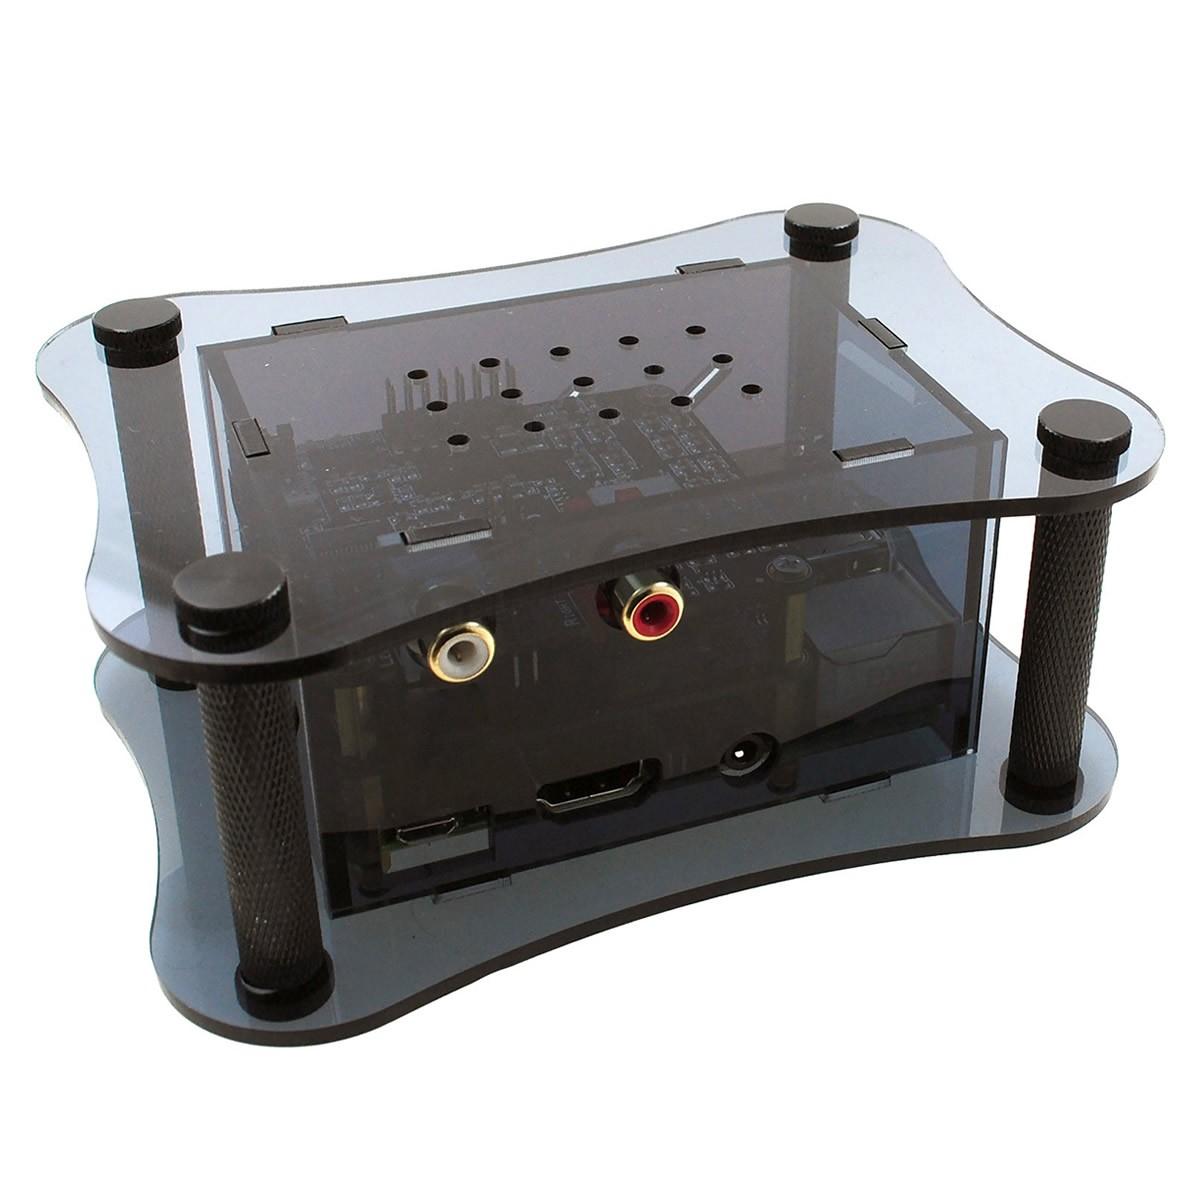 ALLO Boîtier acrylique pour Raspberry Pi 2 / 3 & DAC Boss & Isolator Noir